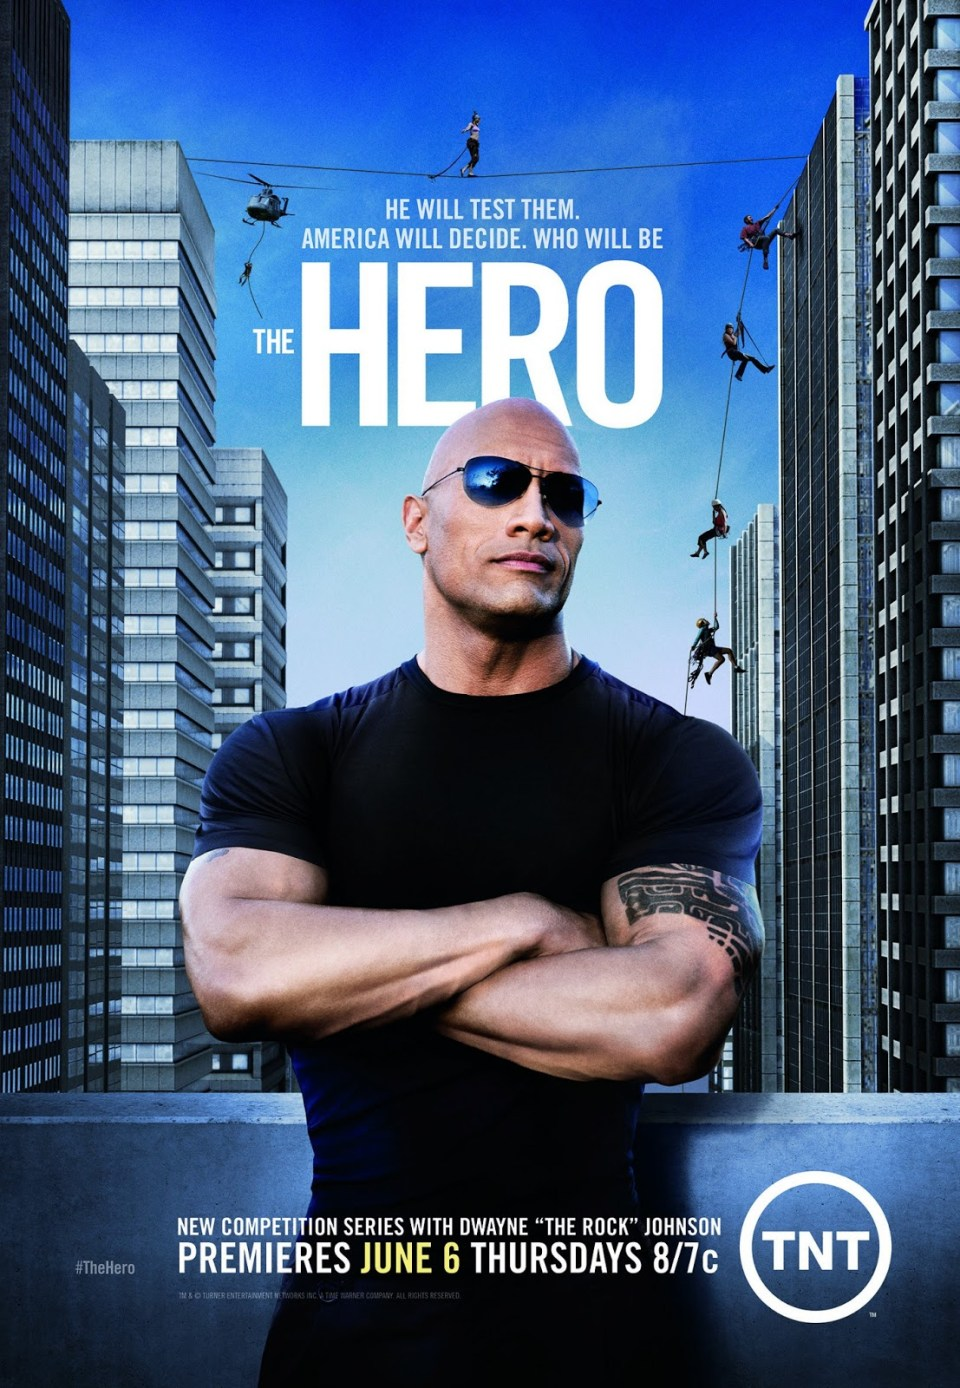 The hero dwayne poster